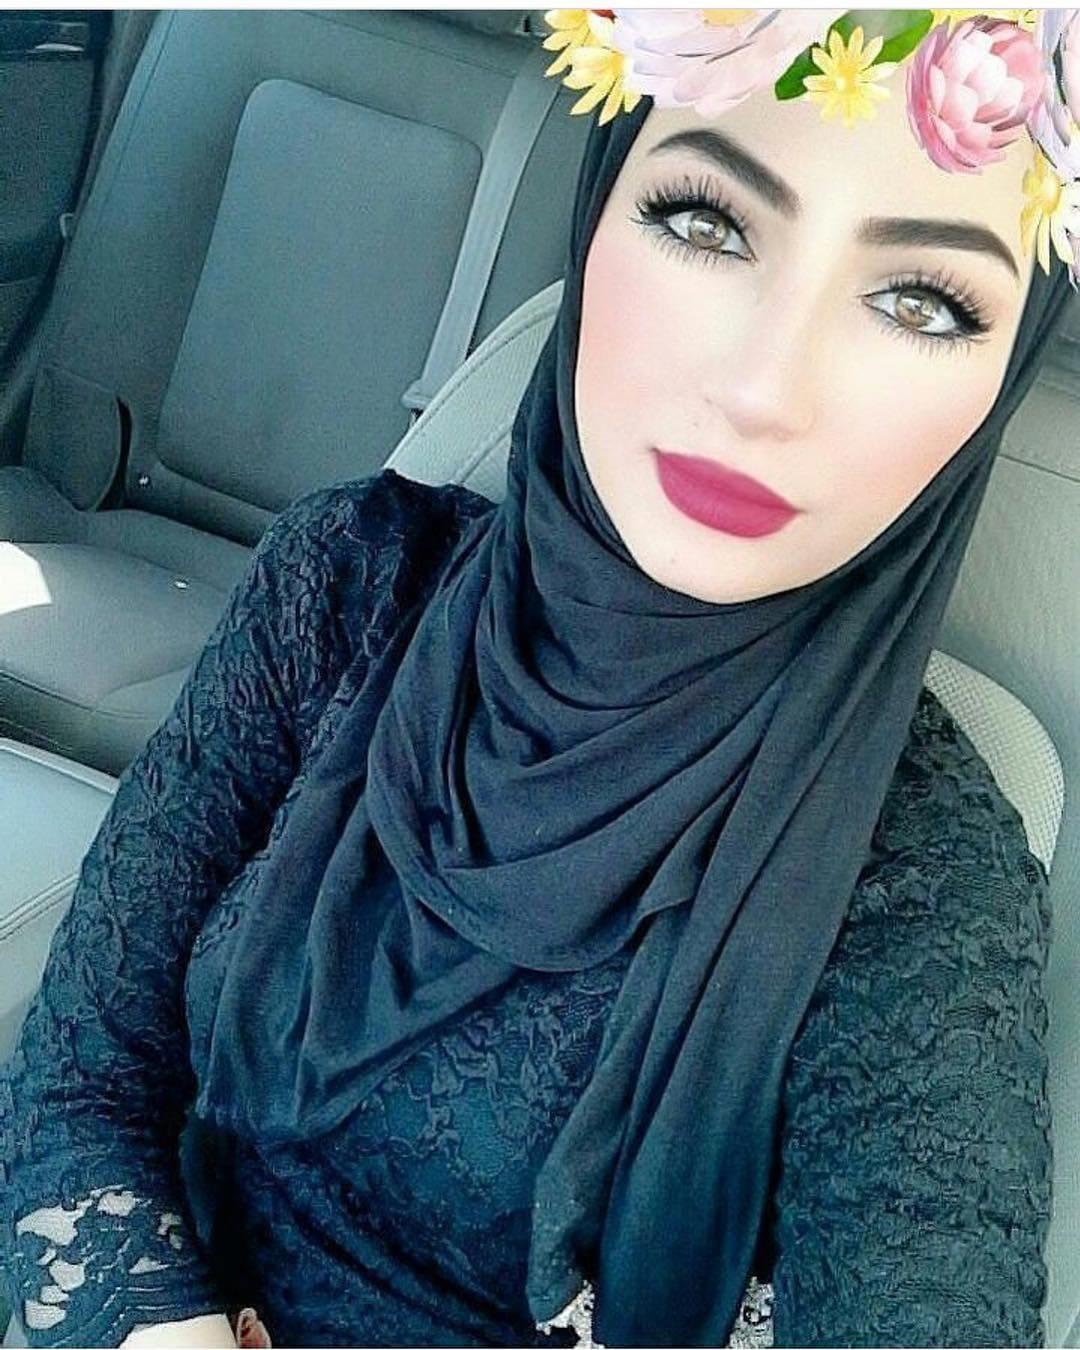 صور بنات محجبه جميله افضل صور للبنات بالحجاب 2019 عيون